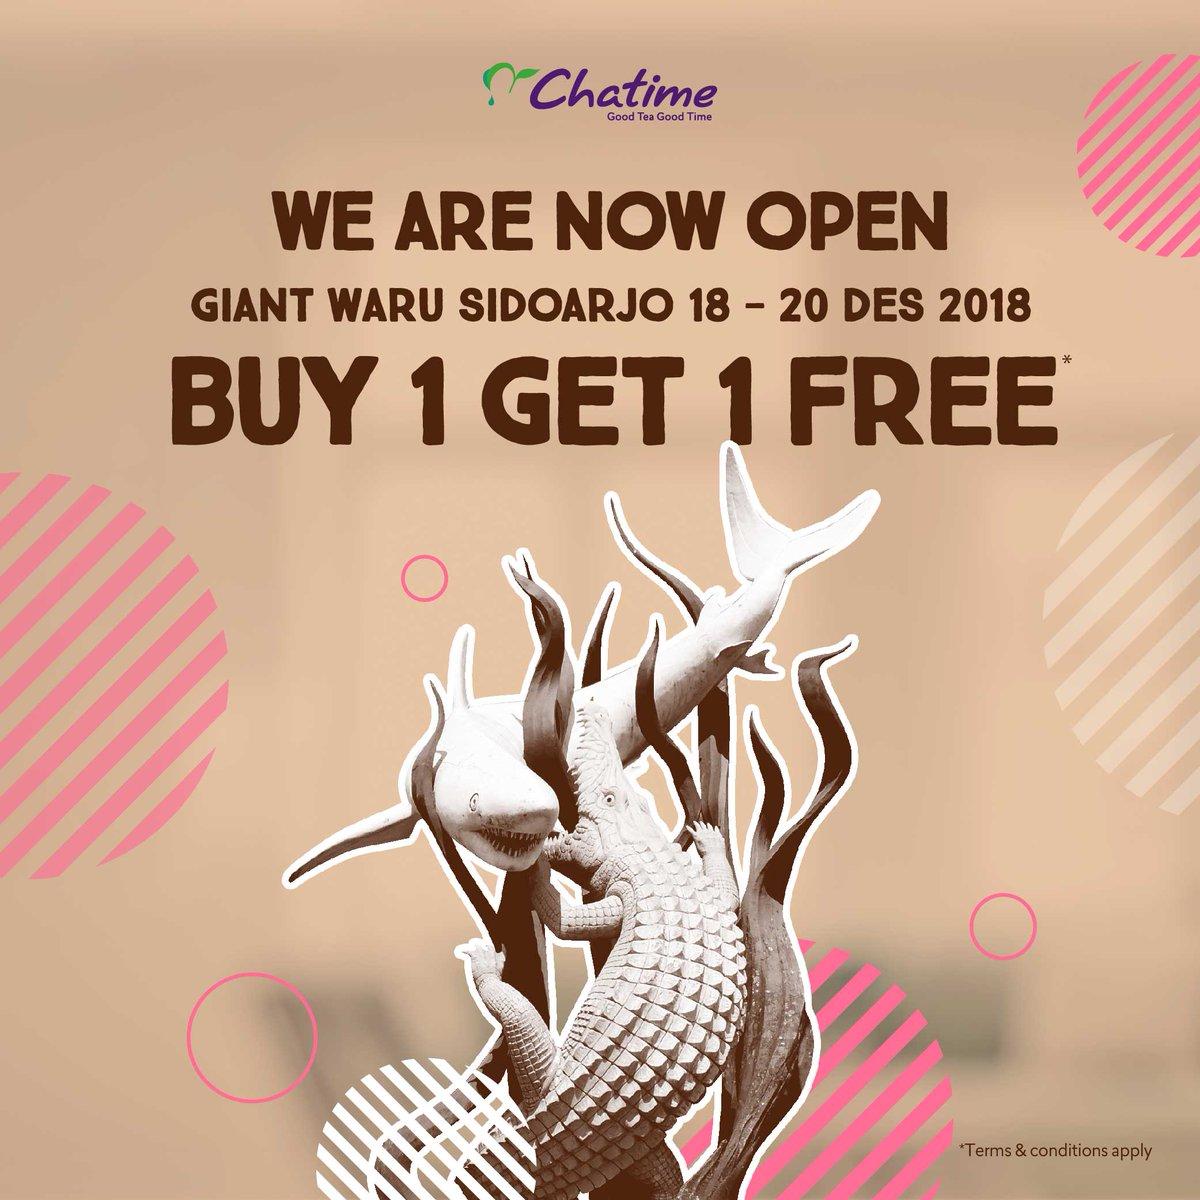 #Chatime - Promo Buy 1 Get 1 di Opening Chatime Giant Waru Sidoarjo (s.d 20 Des 2018)